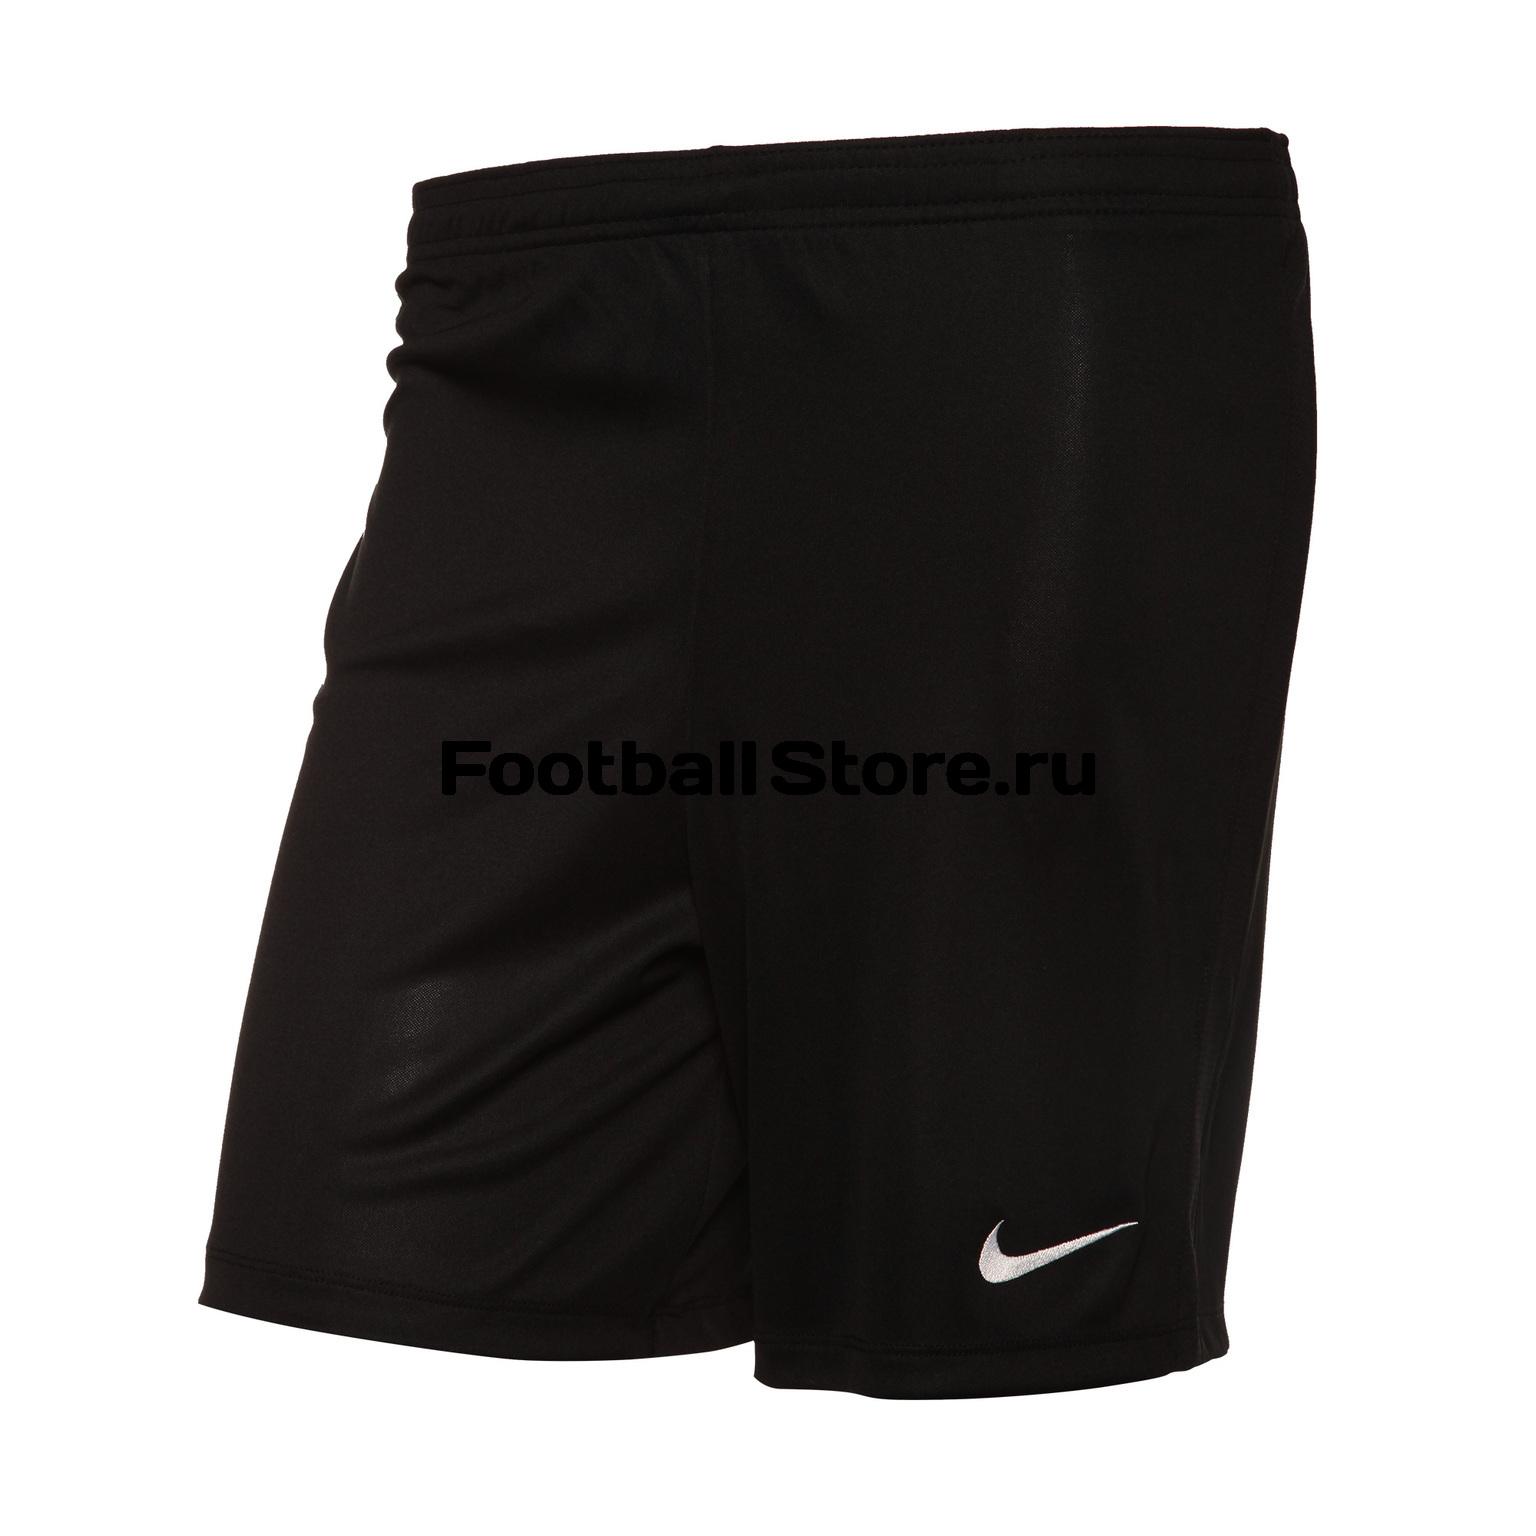 Шорты тренировочные Nike YTH Dry Academy18 Short 893748-010 цены онлайн